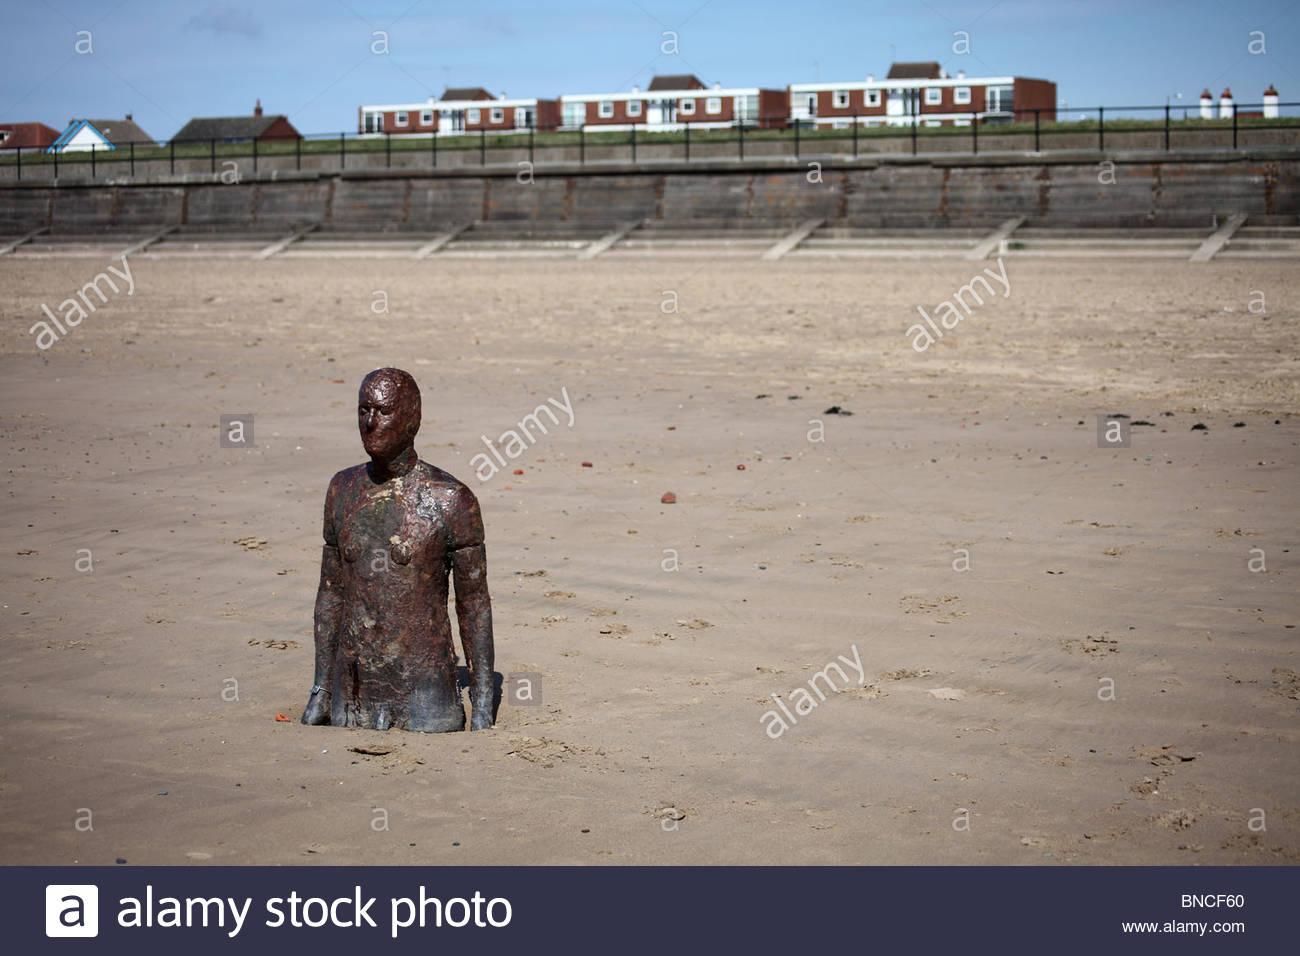 Half-buried Antony Gormley cast-iron sculpture on Crosby Beach, Sefton,  Liverpool